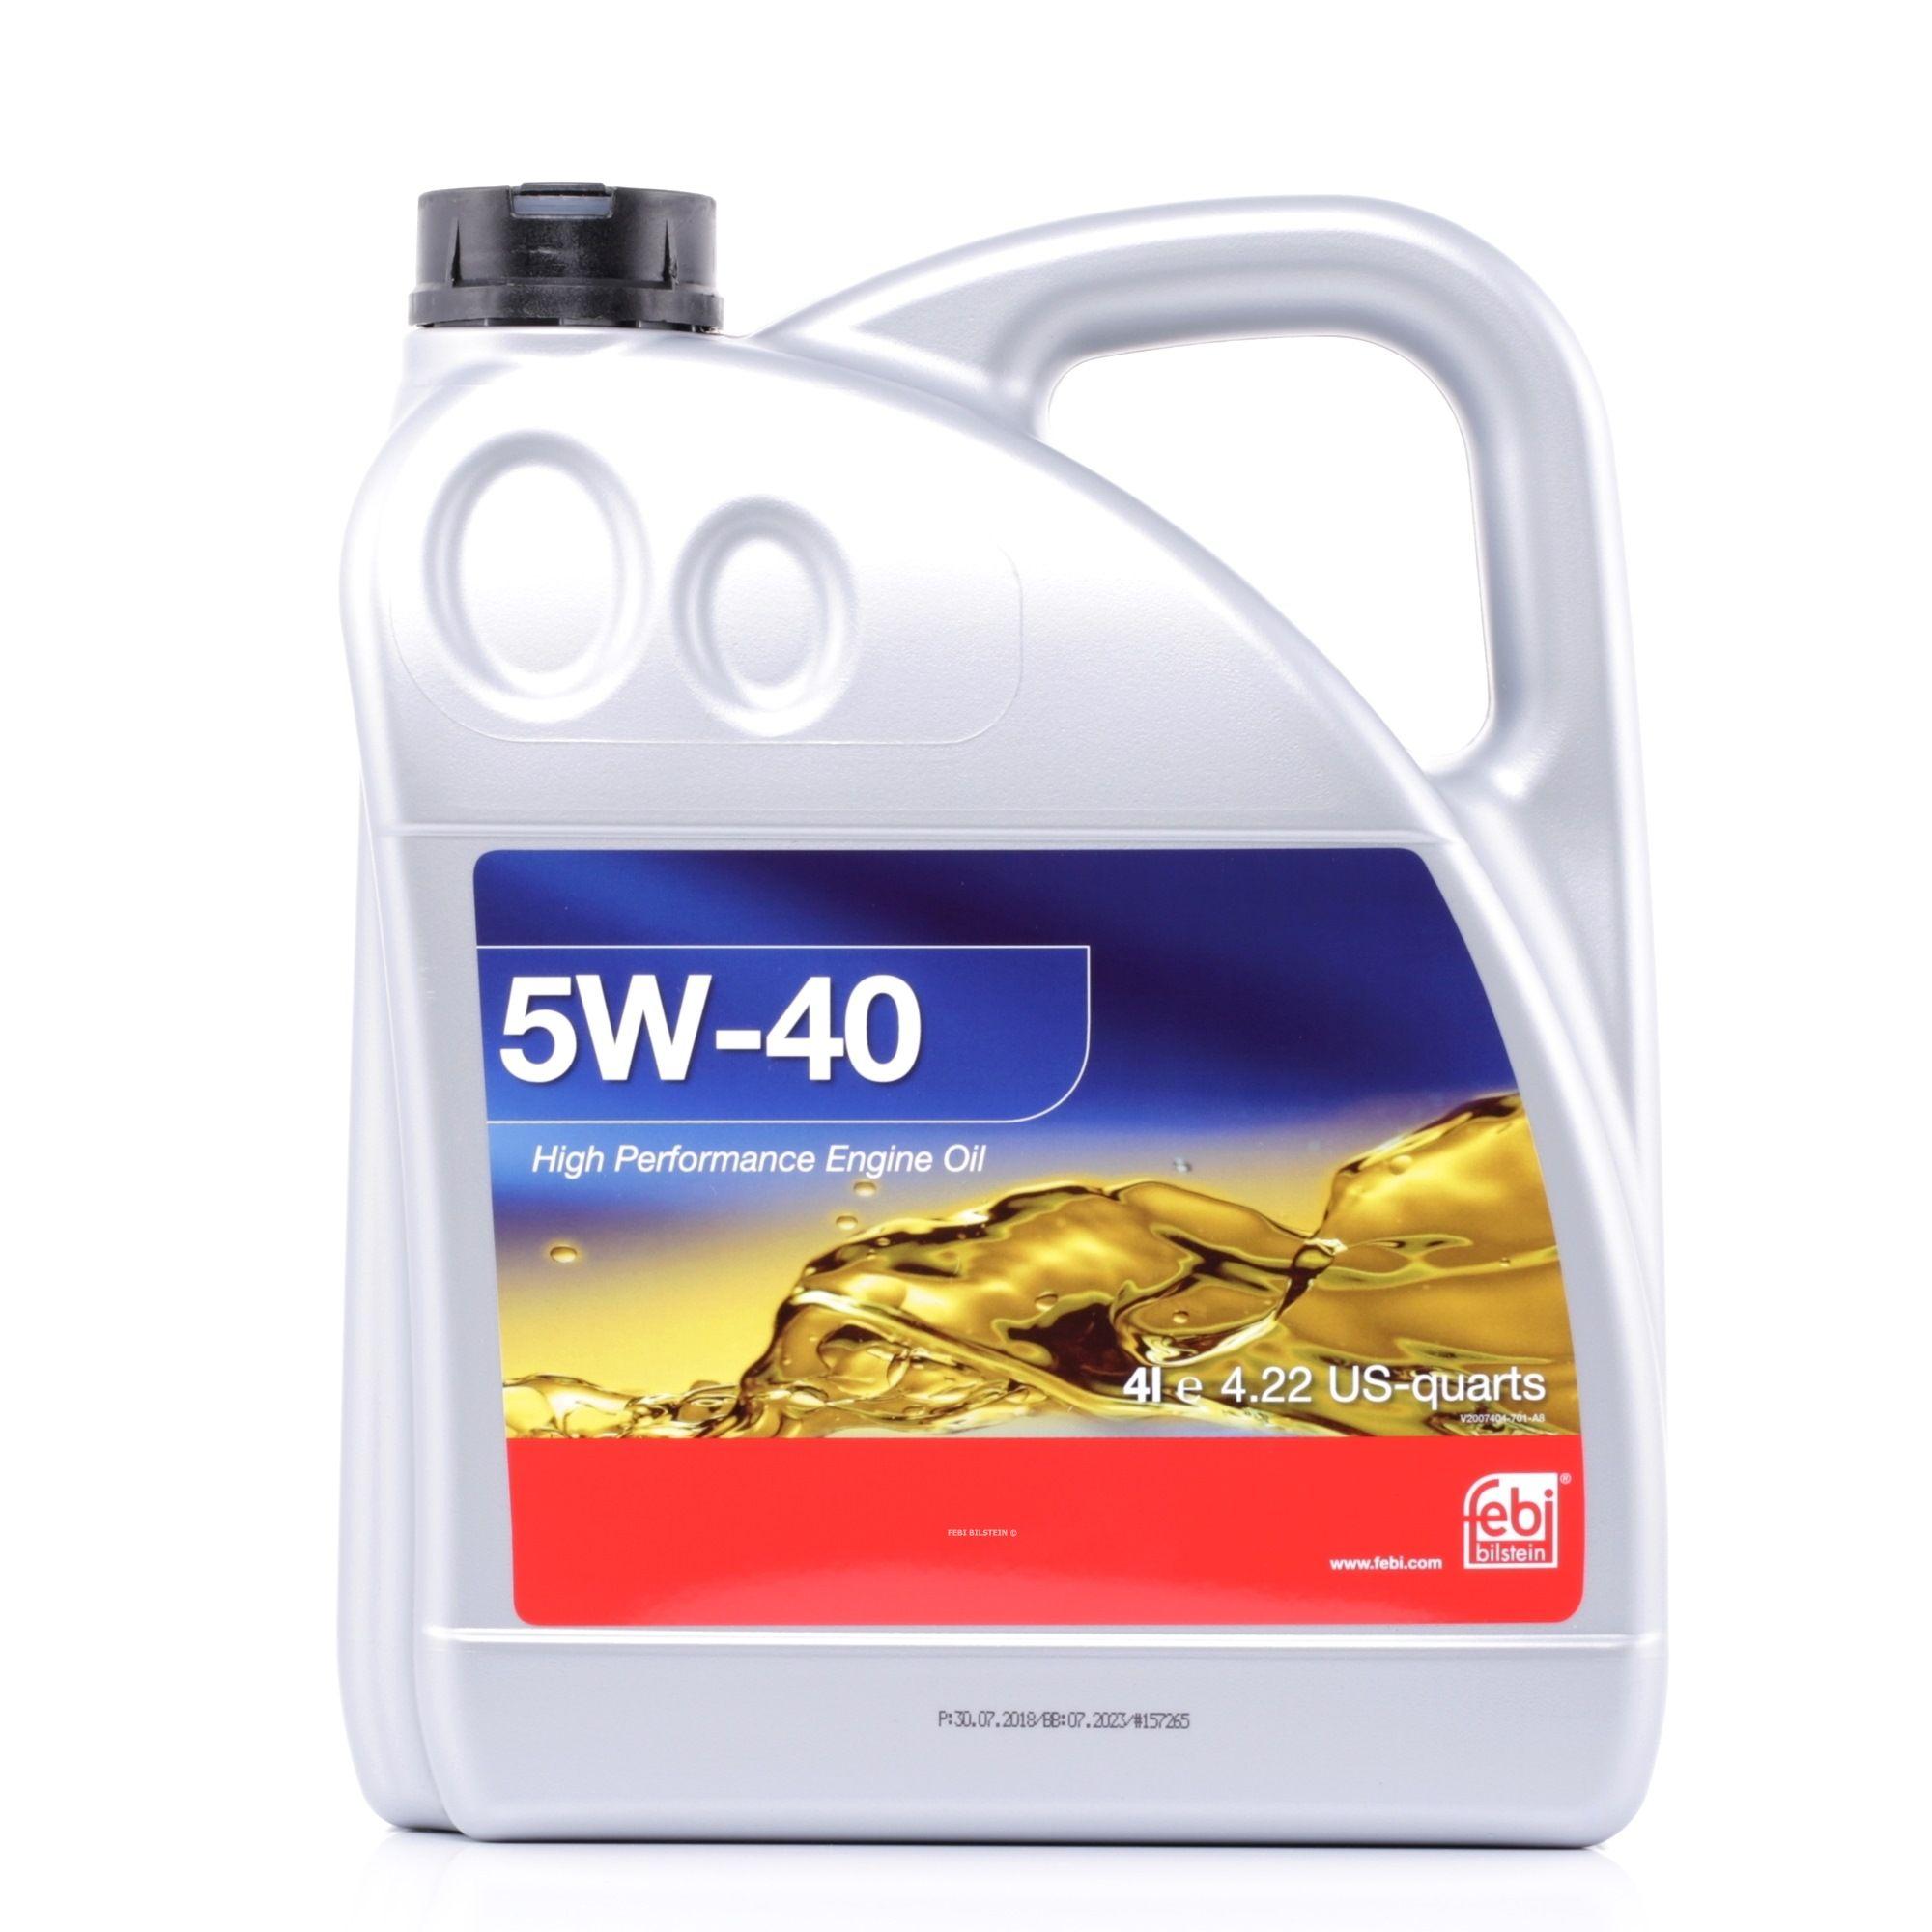 Engine Fluid FEBI BILSTEIN VW5020050500 rating